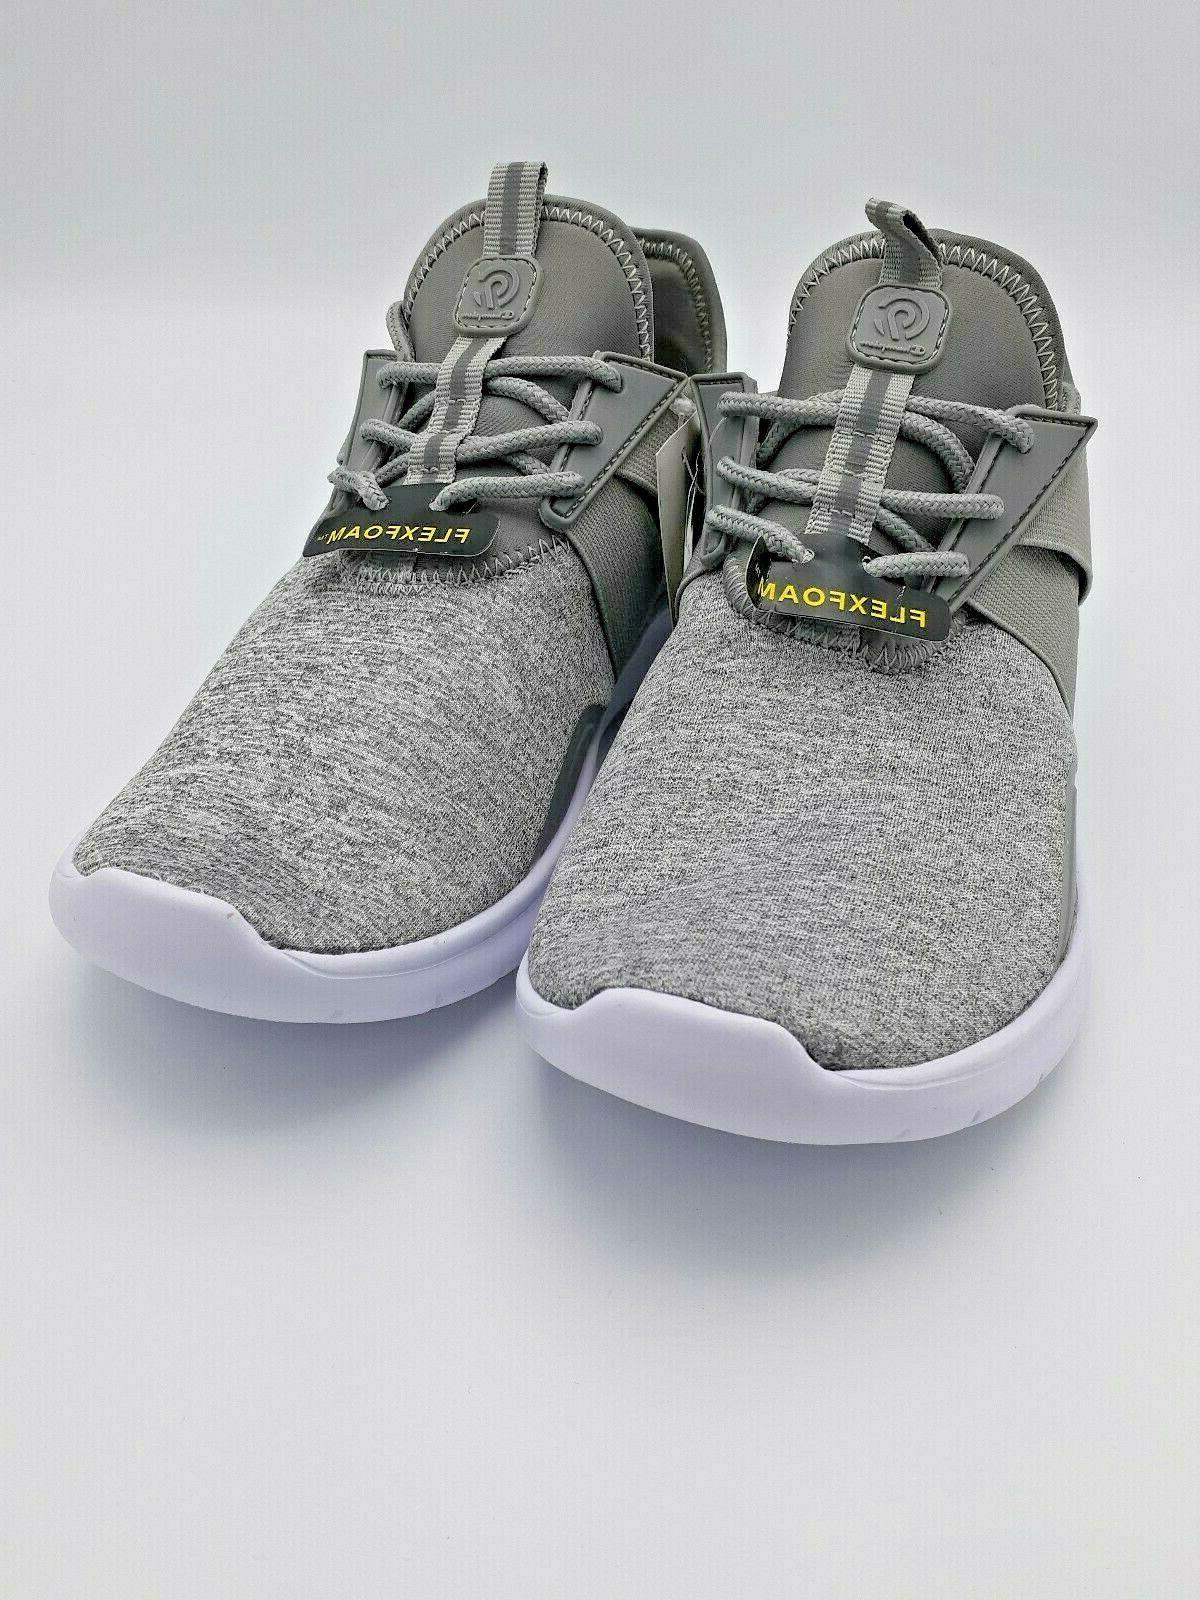 womens drive 4 spacedye heathered sneakers gray